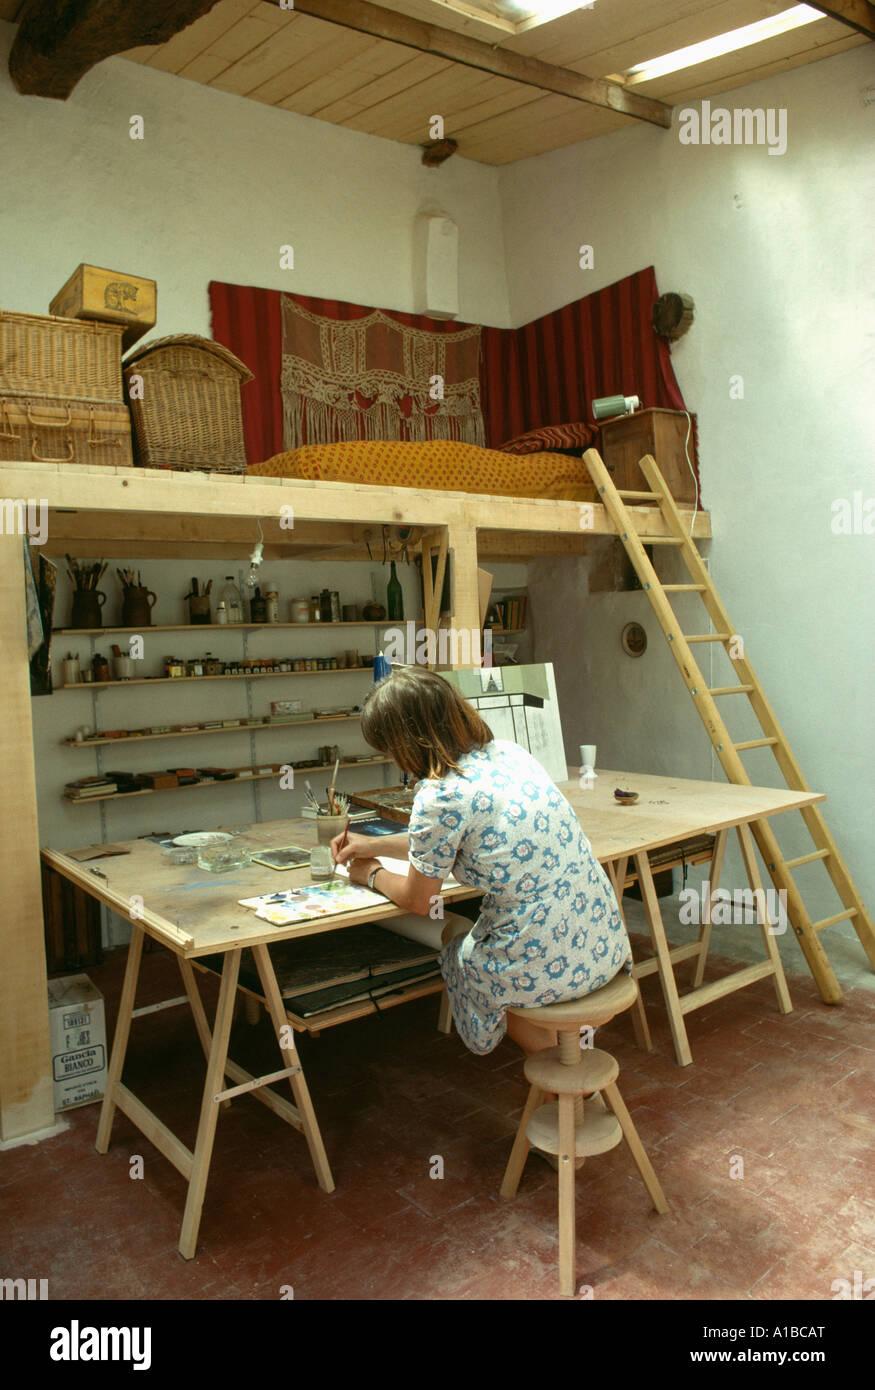 Artist working at trestle table below platform bed in ...